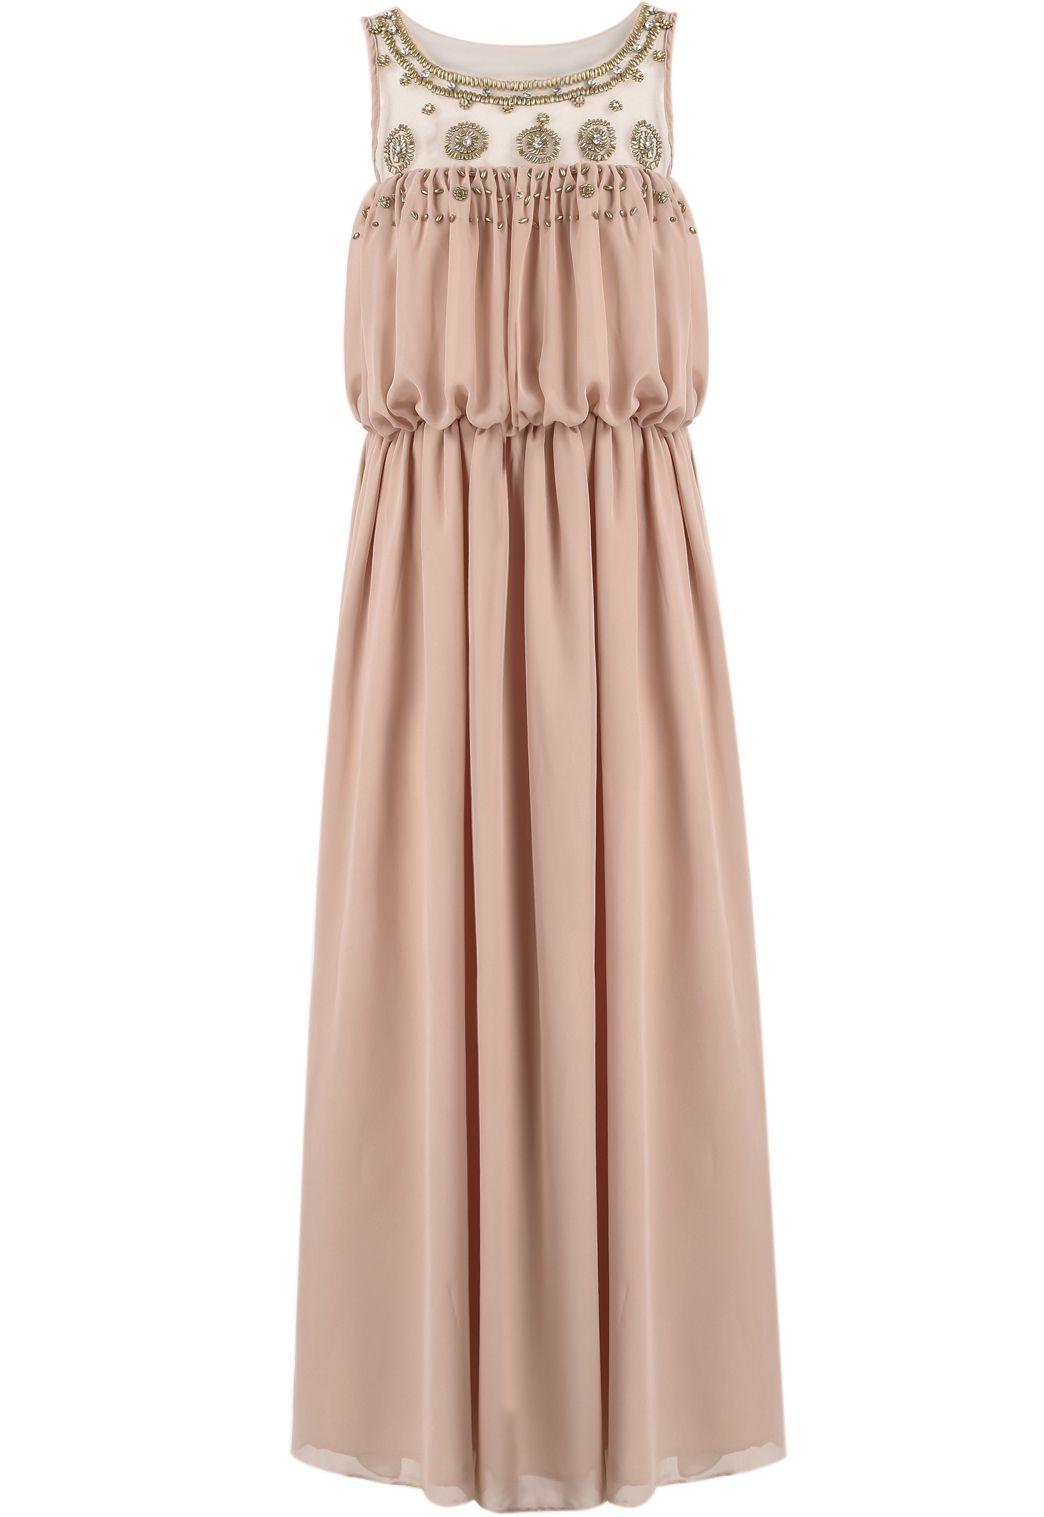 Pink Sleeveless Bead Pleated Maxi Dress - Sheinside.com